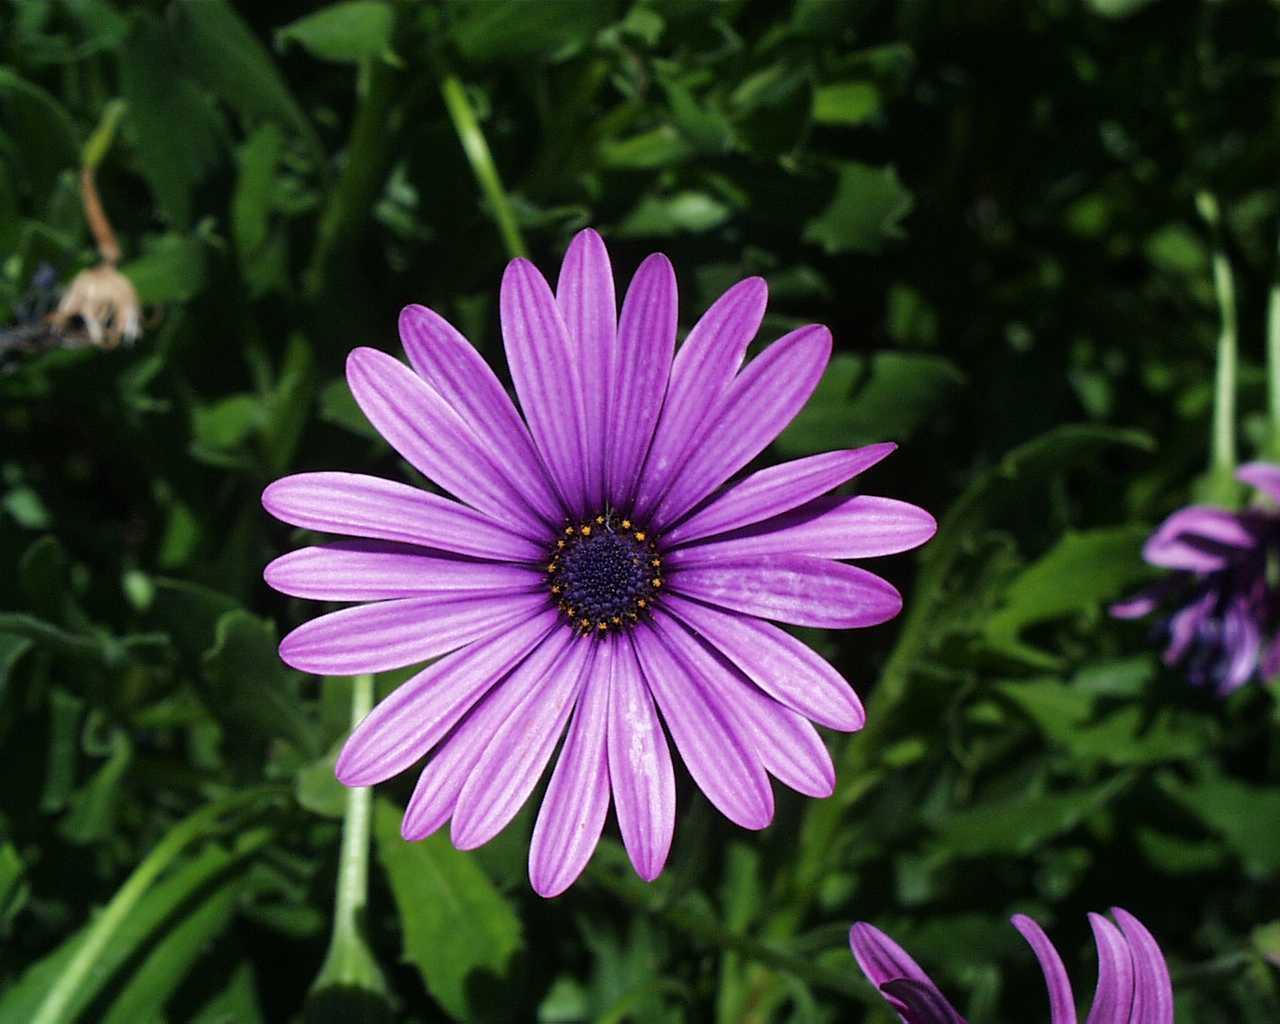 flowers for flower lovers.: Daisy flower wallpapers.